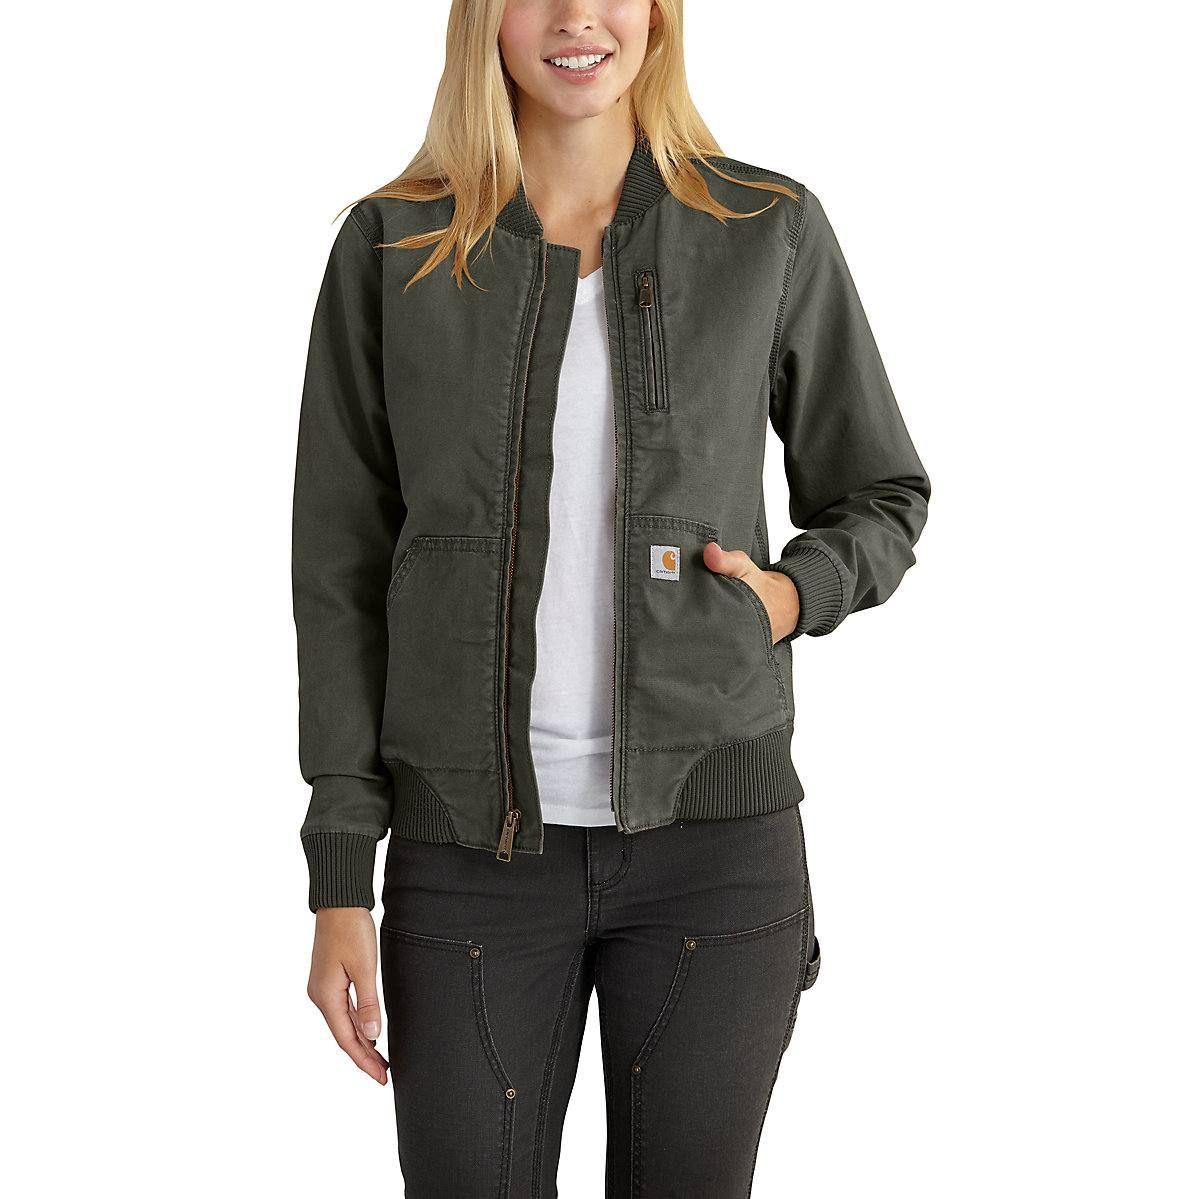 Crawford Bomber Jacket Bomber Jacket Women Bomber Jacket Outerwear Women [ 1199 x 1200 Pixel ]